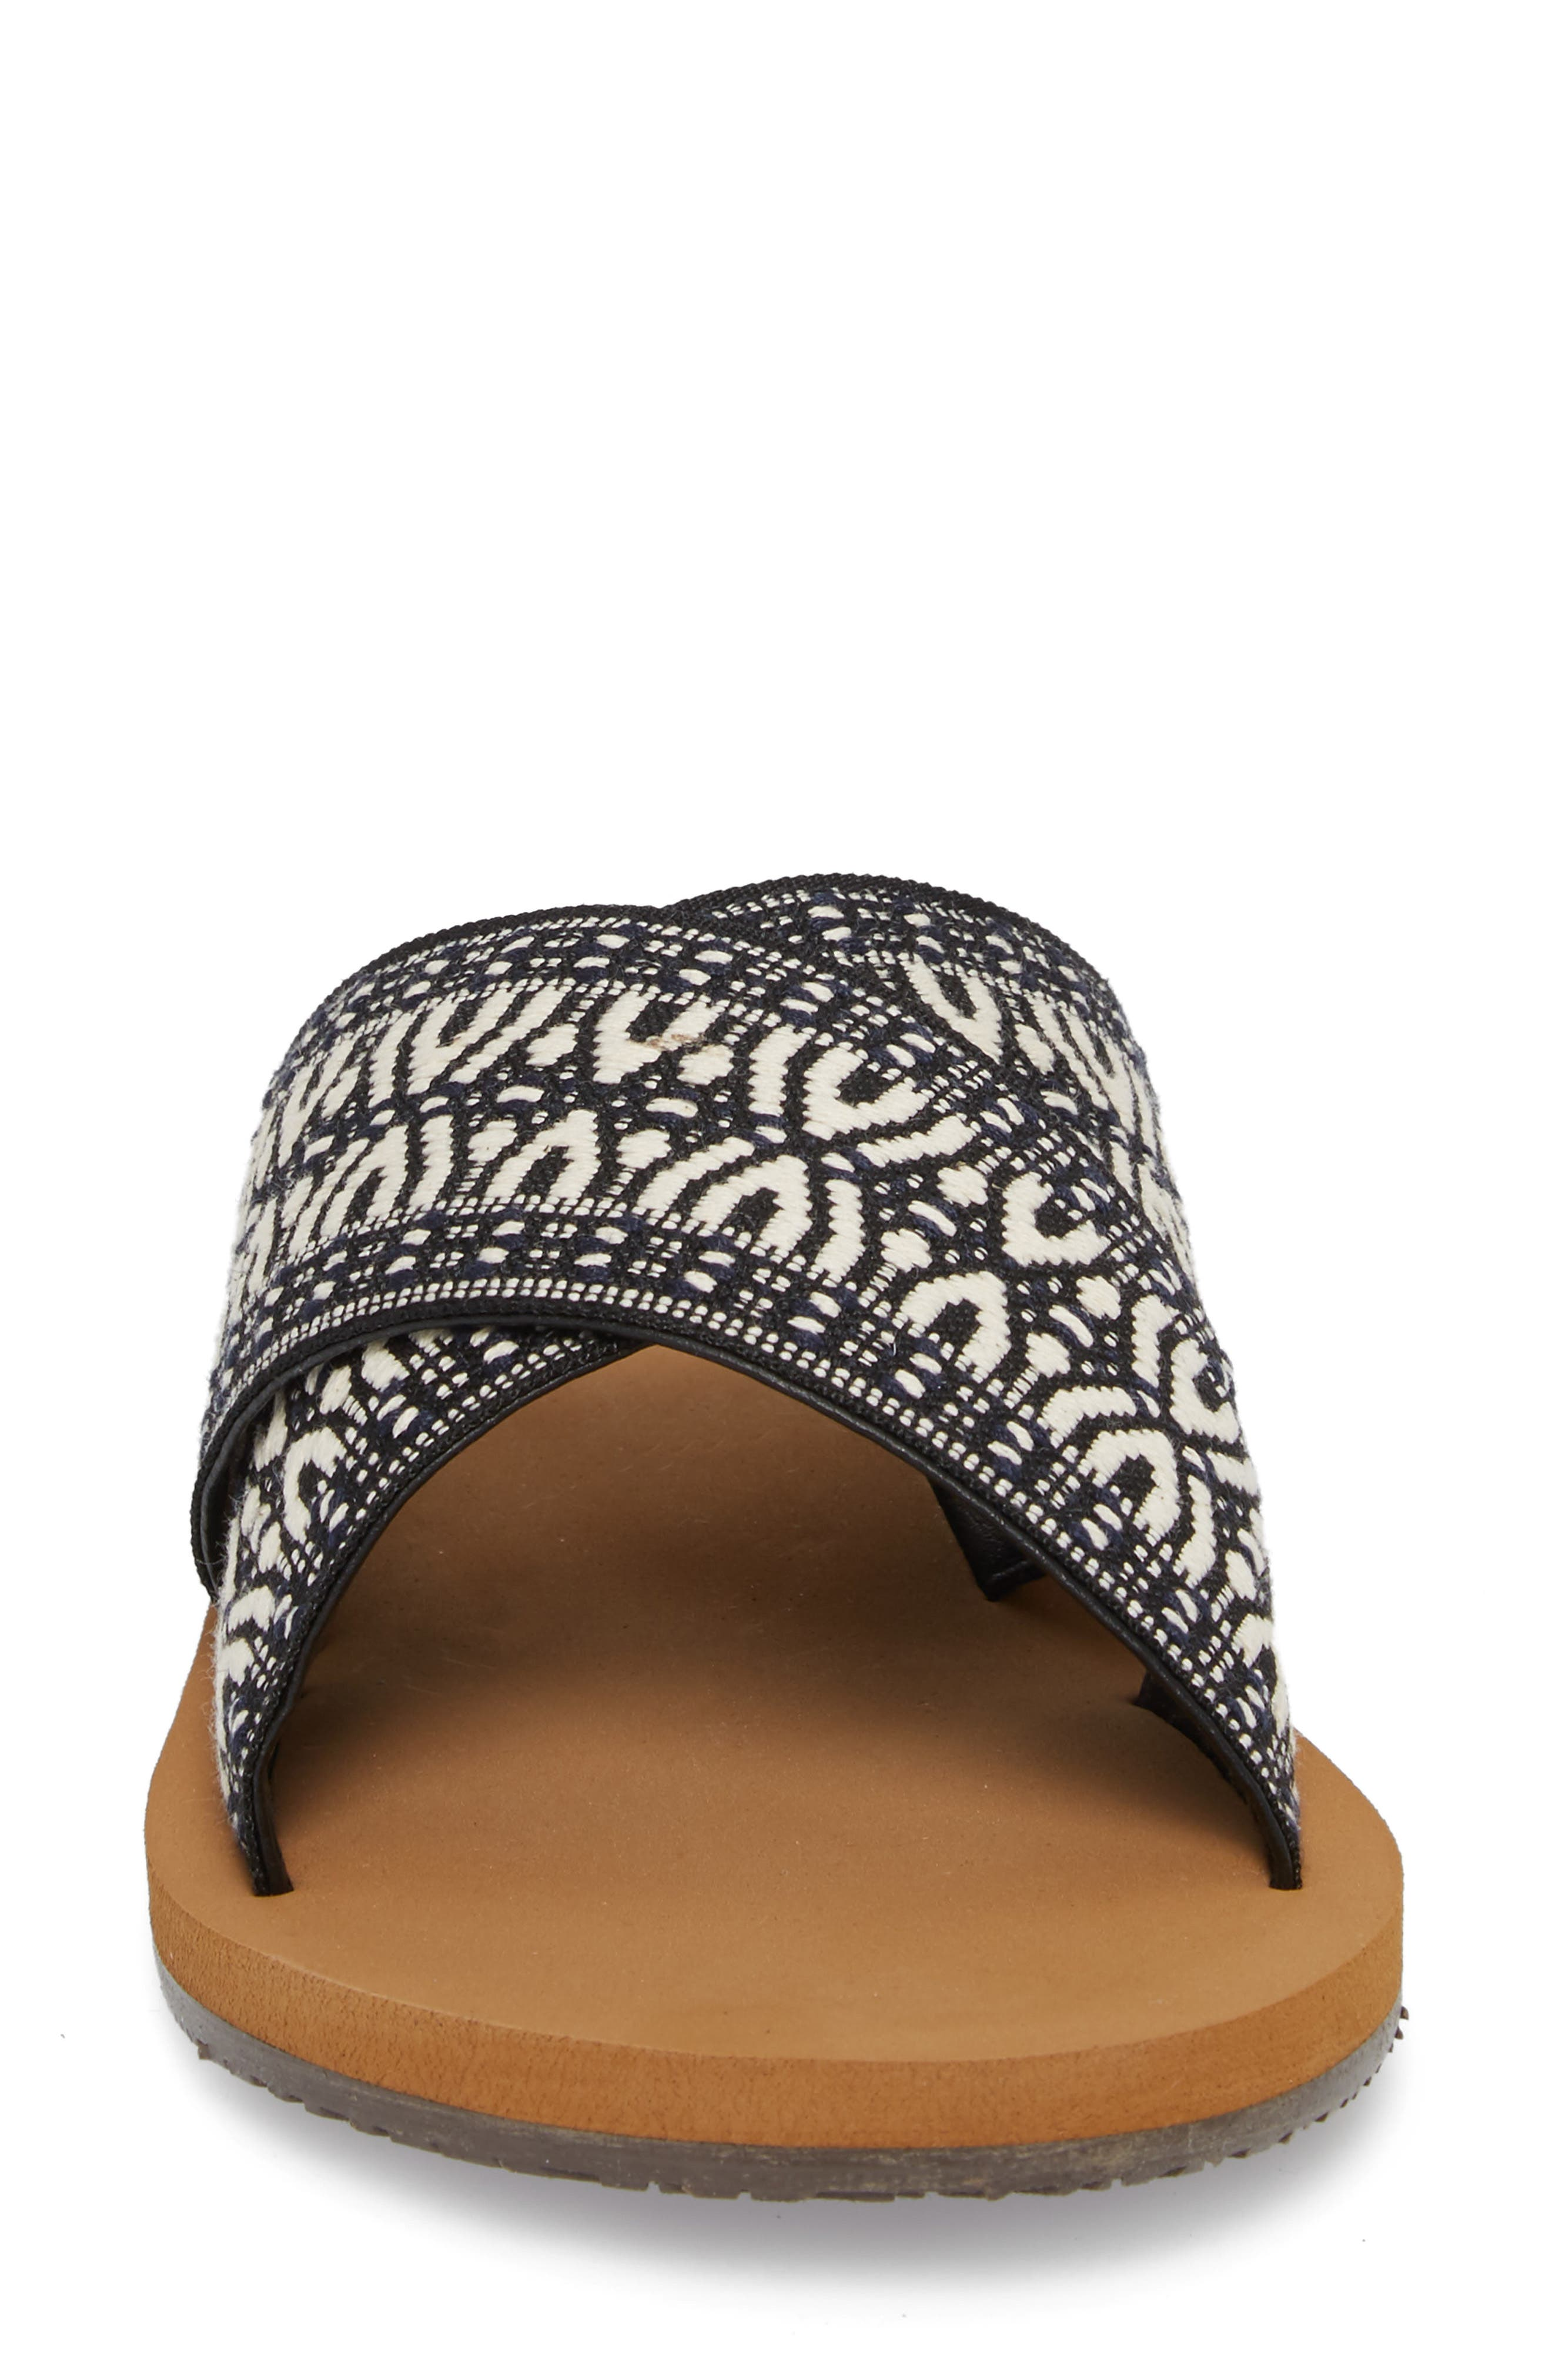 BILLABONG, Surf Bandit Slide Sandal, Alternate thumbnail 4, color, BLACK/ WHITE